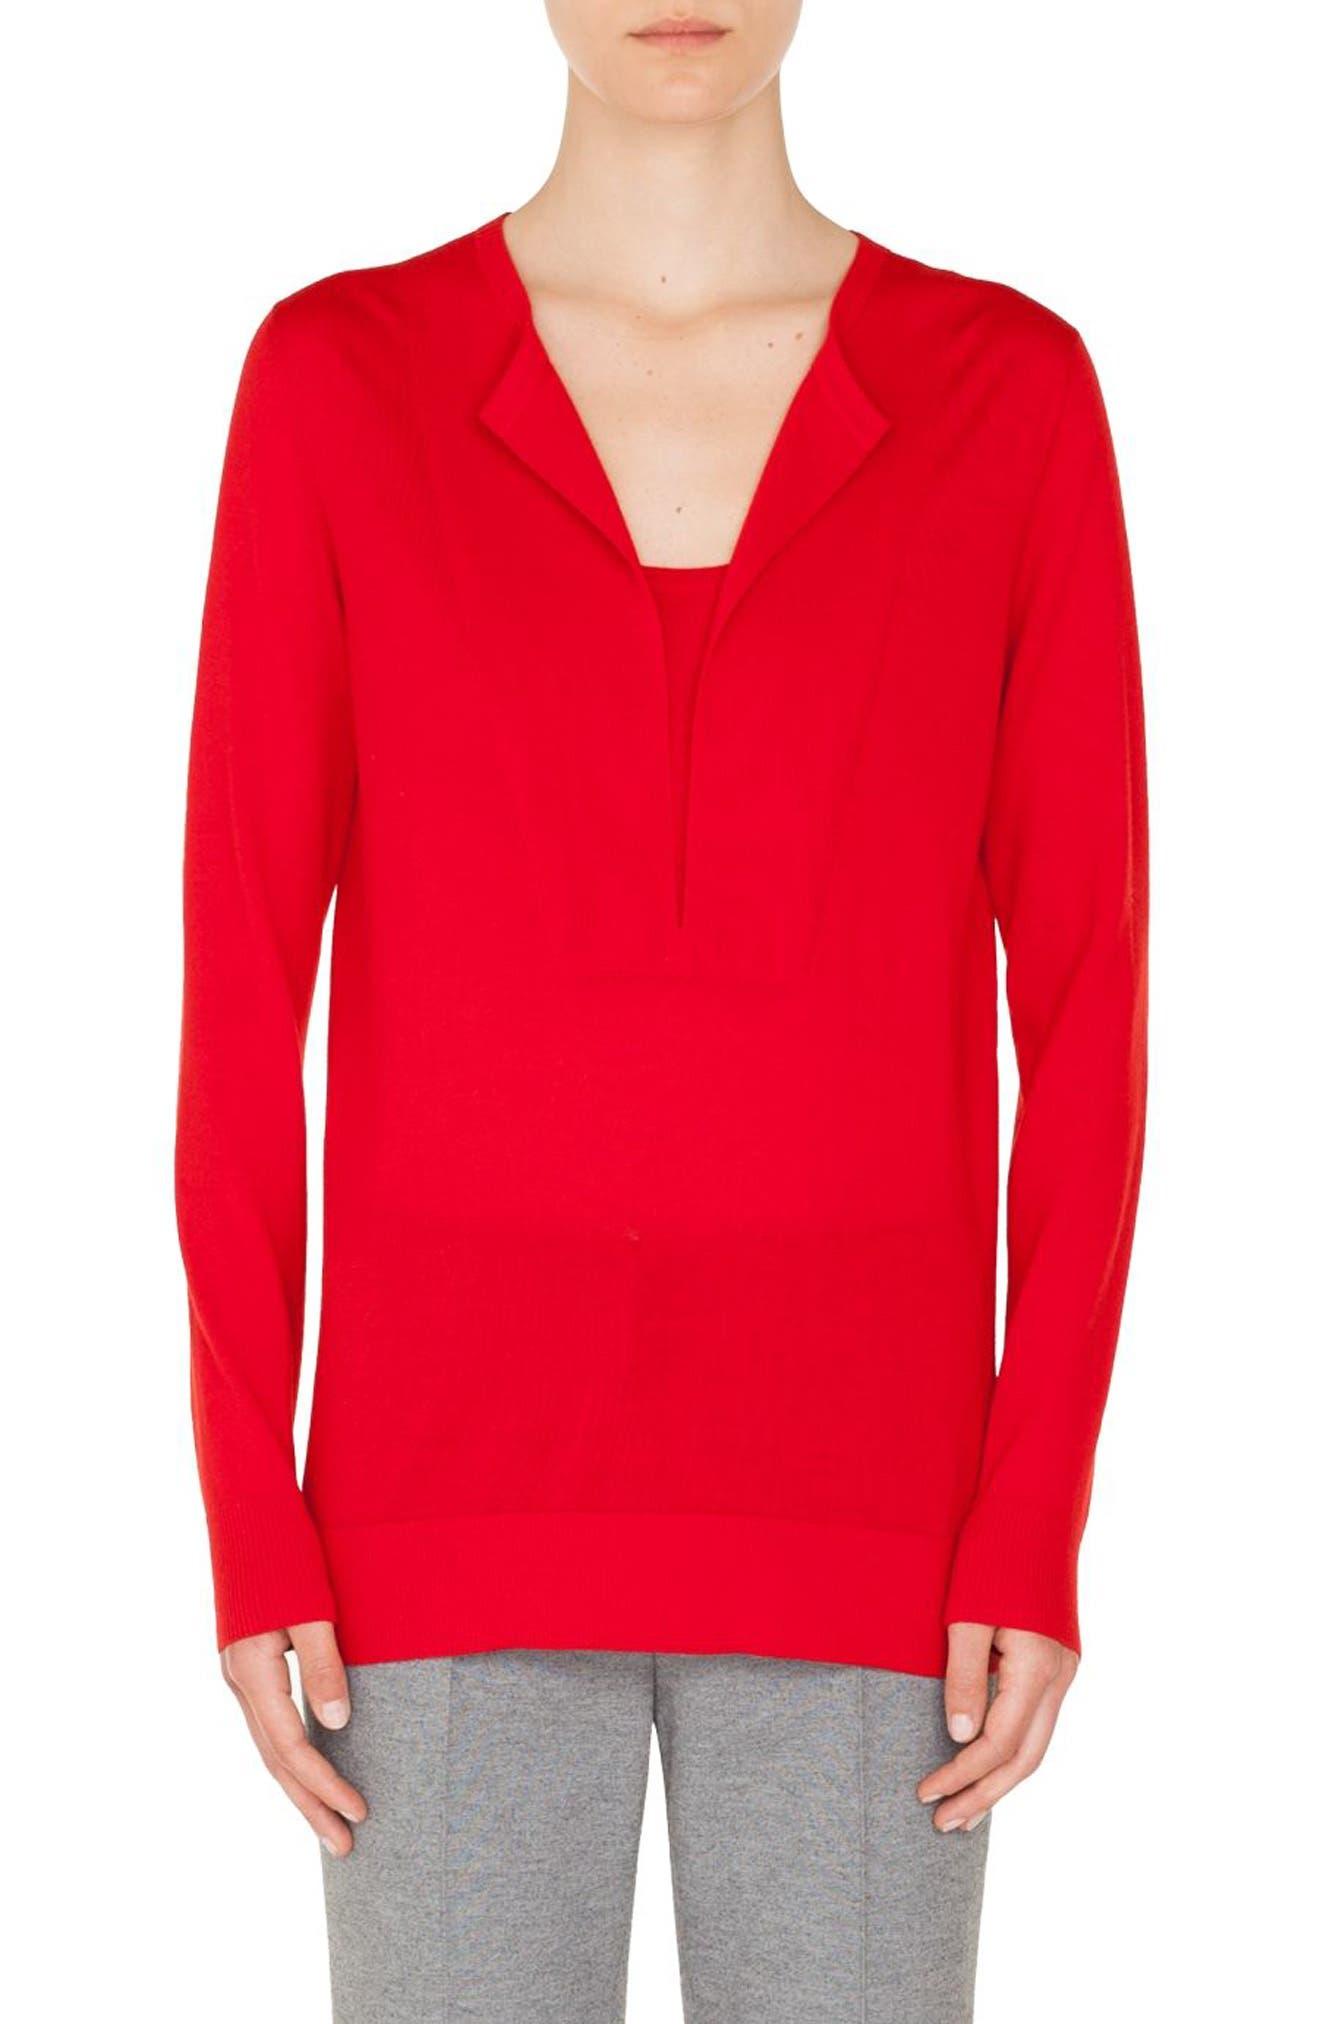 Trompe l'Oeil Wool Sweater,                             Main thumbnail 1, color,                             606